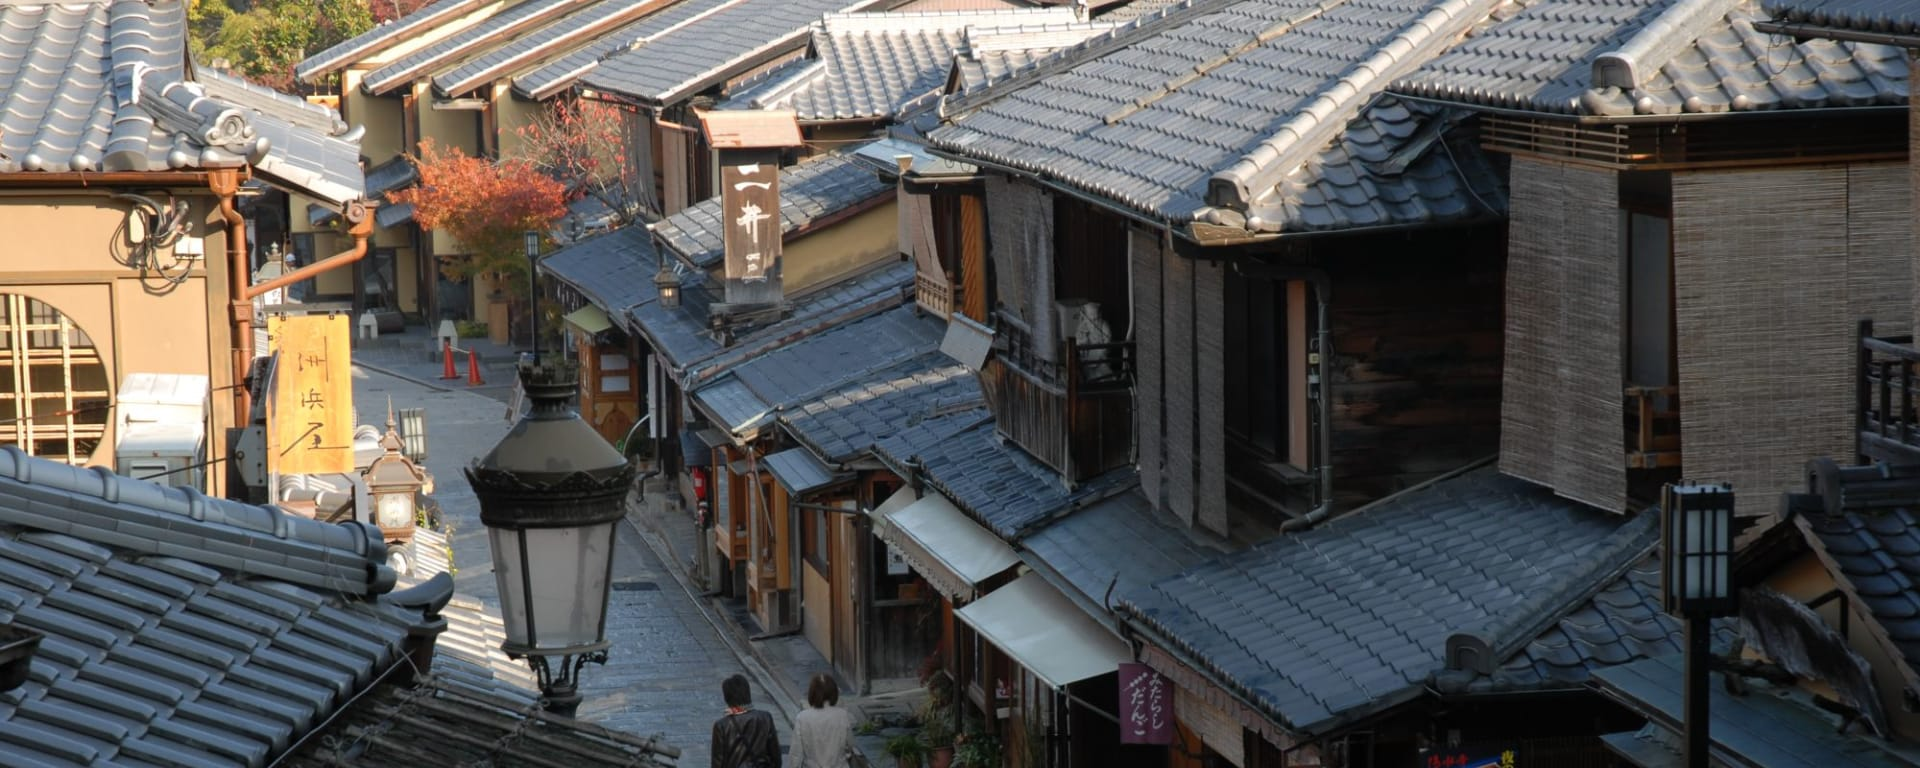 Kyoto Highlights - Ganzer Tag: Kyoto Street life